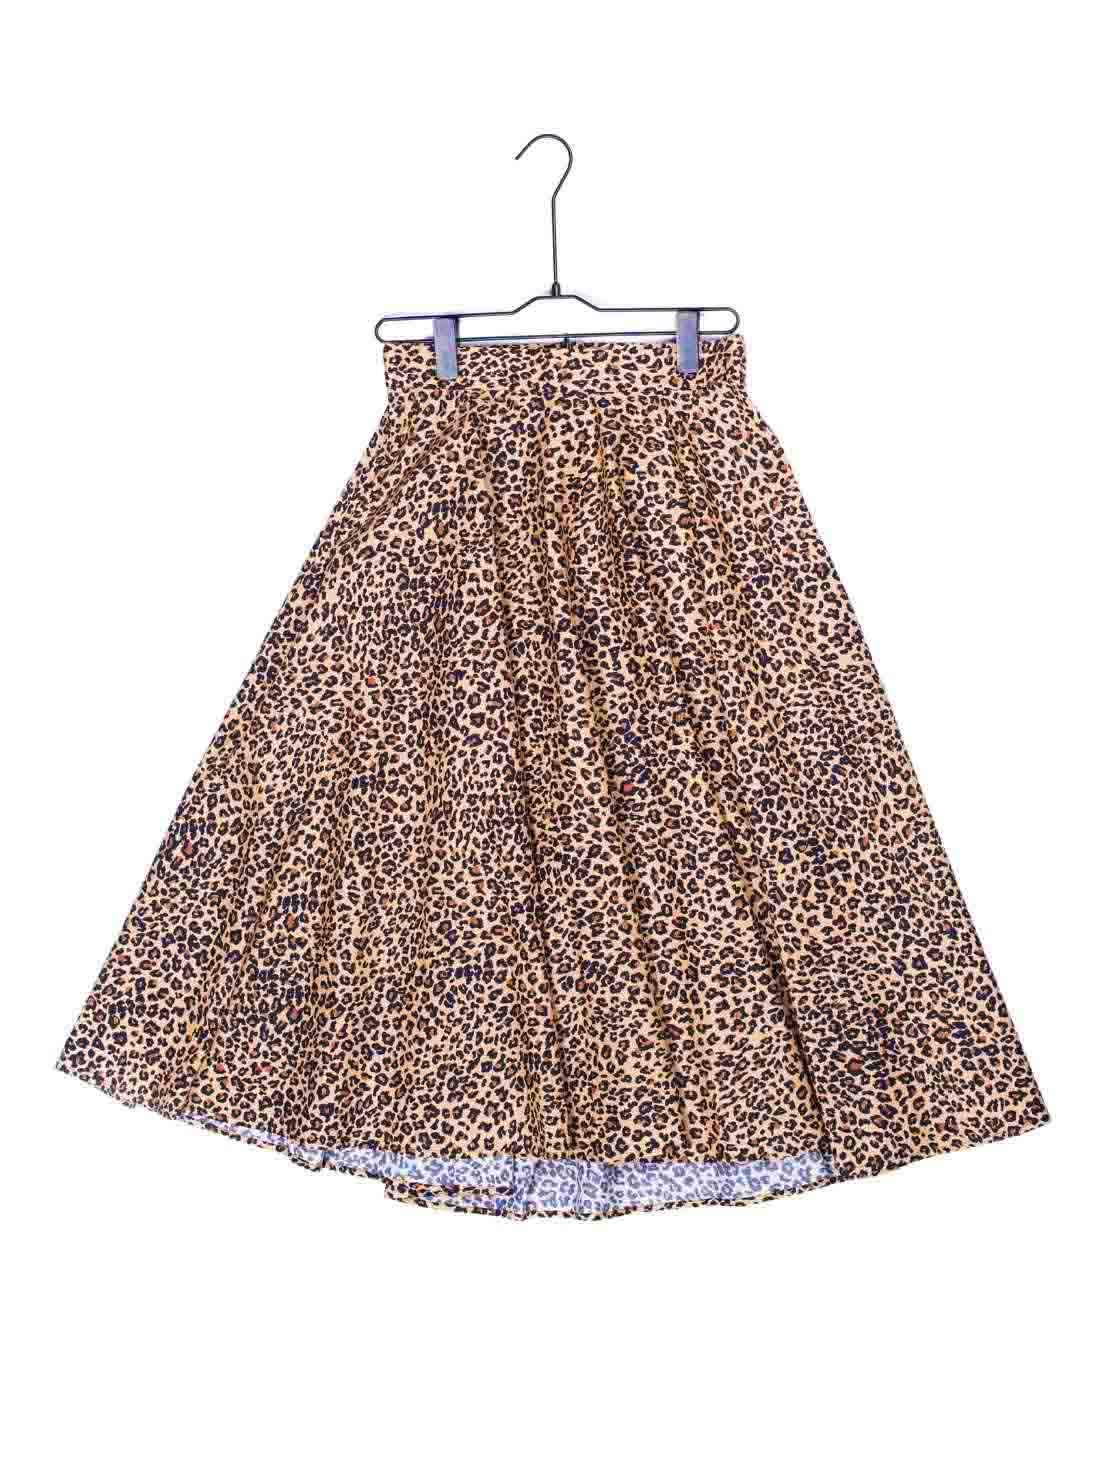 Ladies Cotton Animal Print A line Skirt